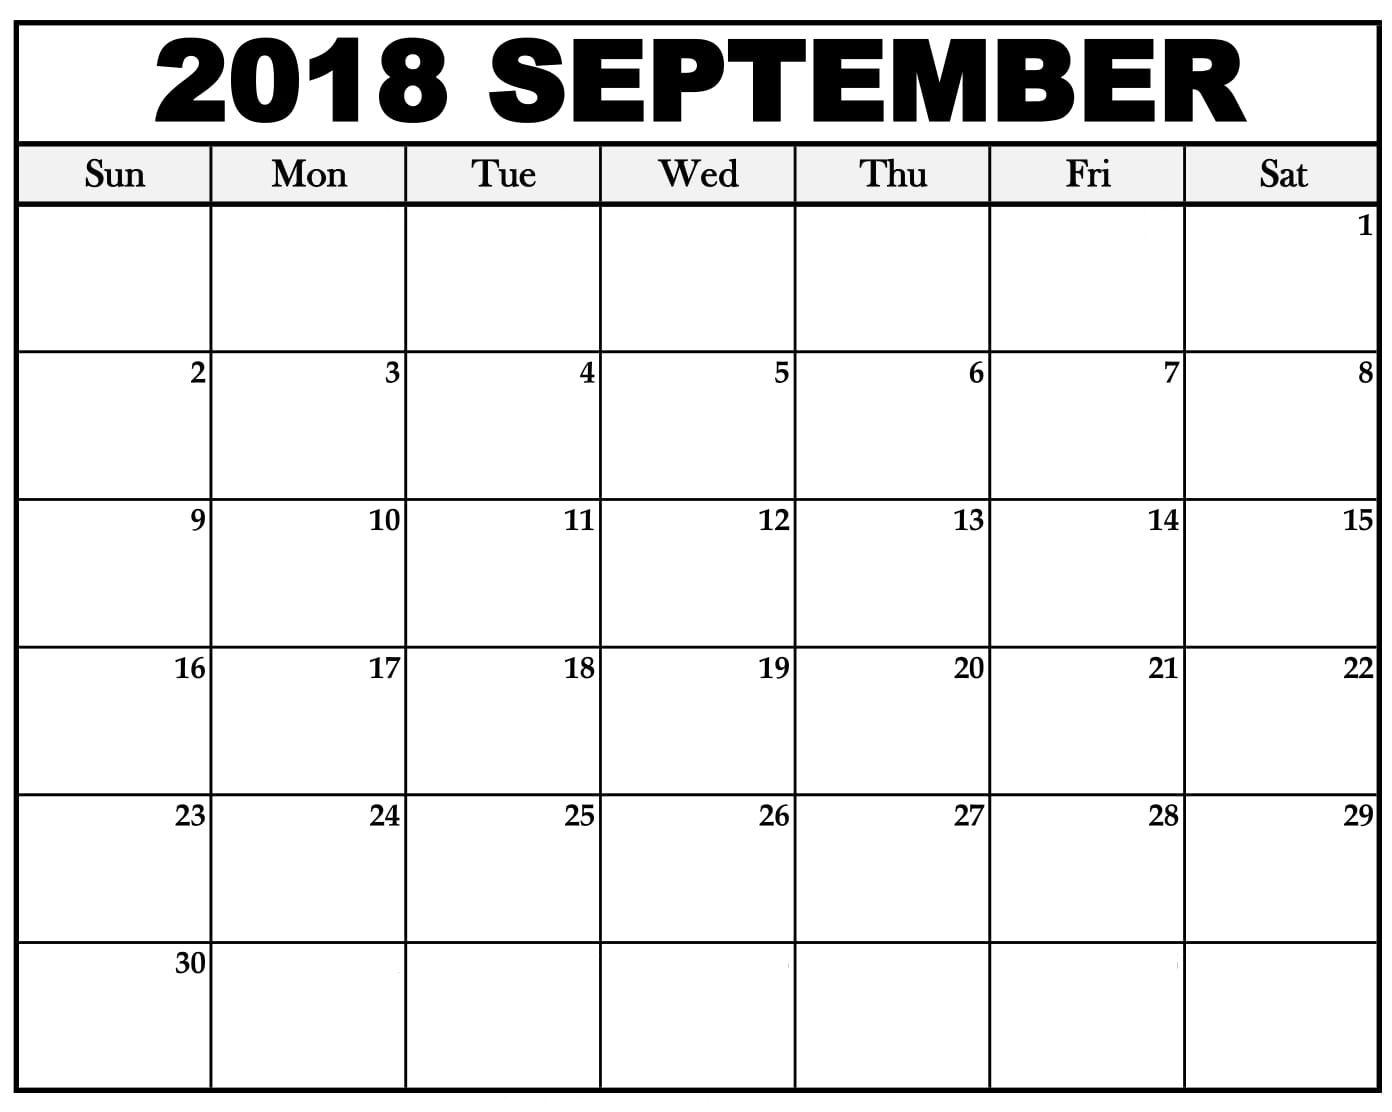 September 2018 Calendar Printable Template